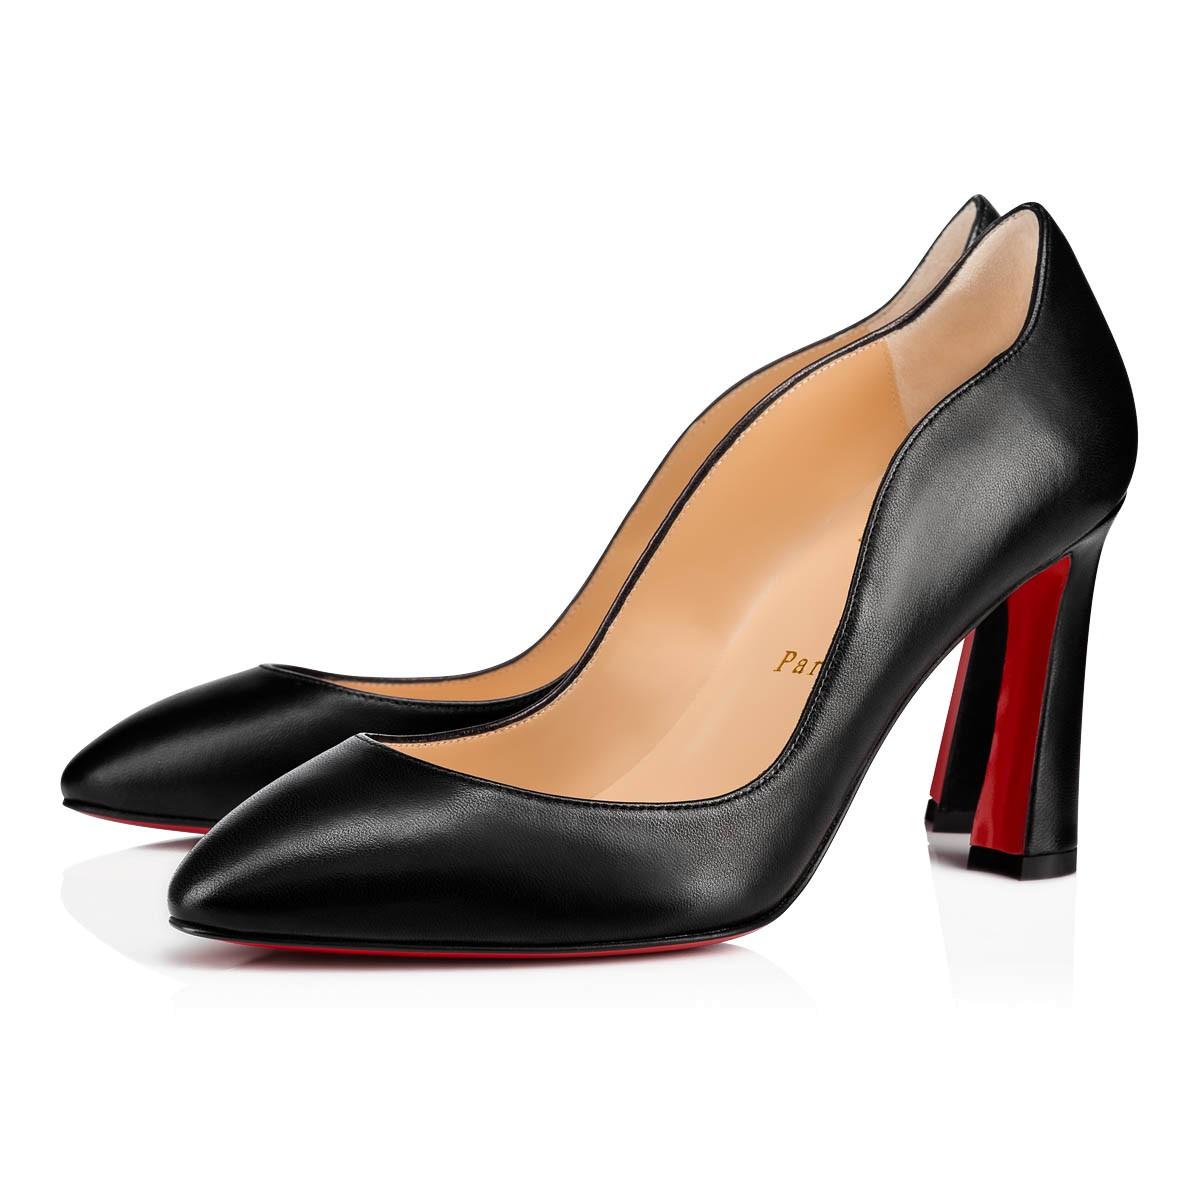 Shoes - Agneska - Christian Louboutin